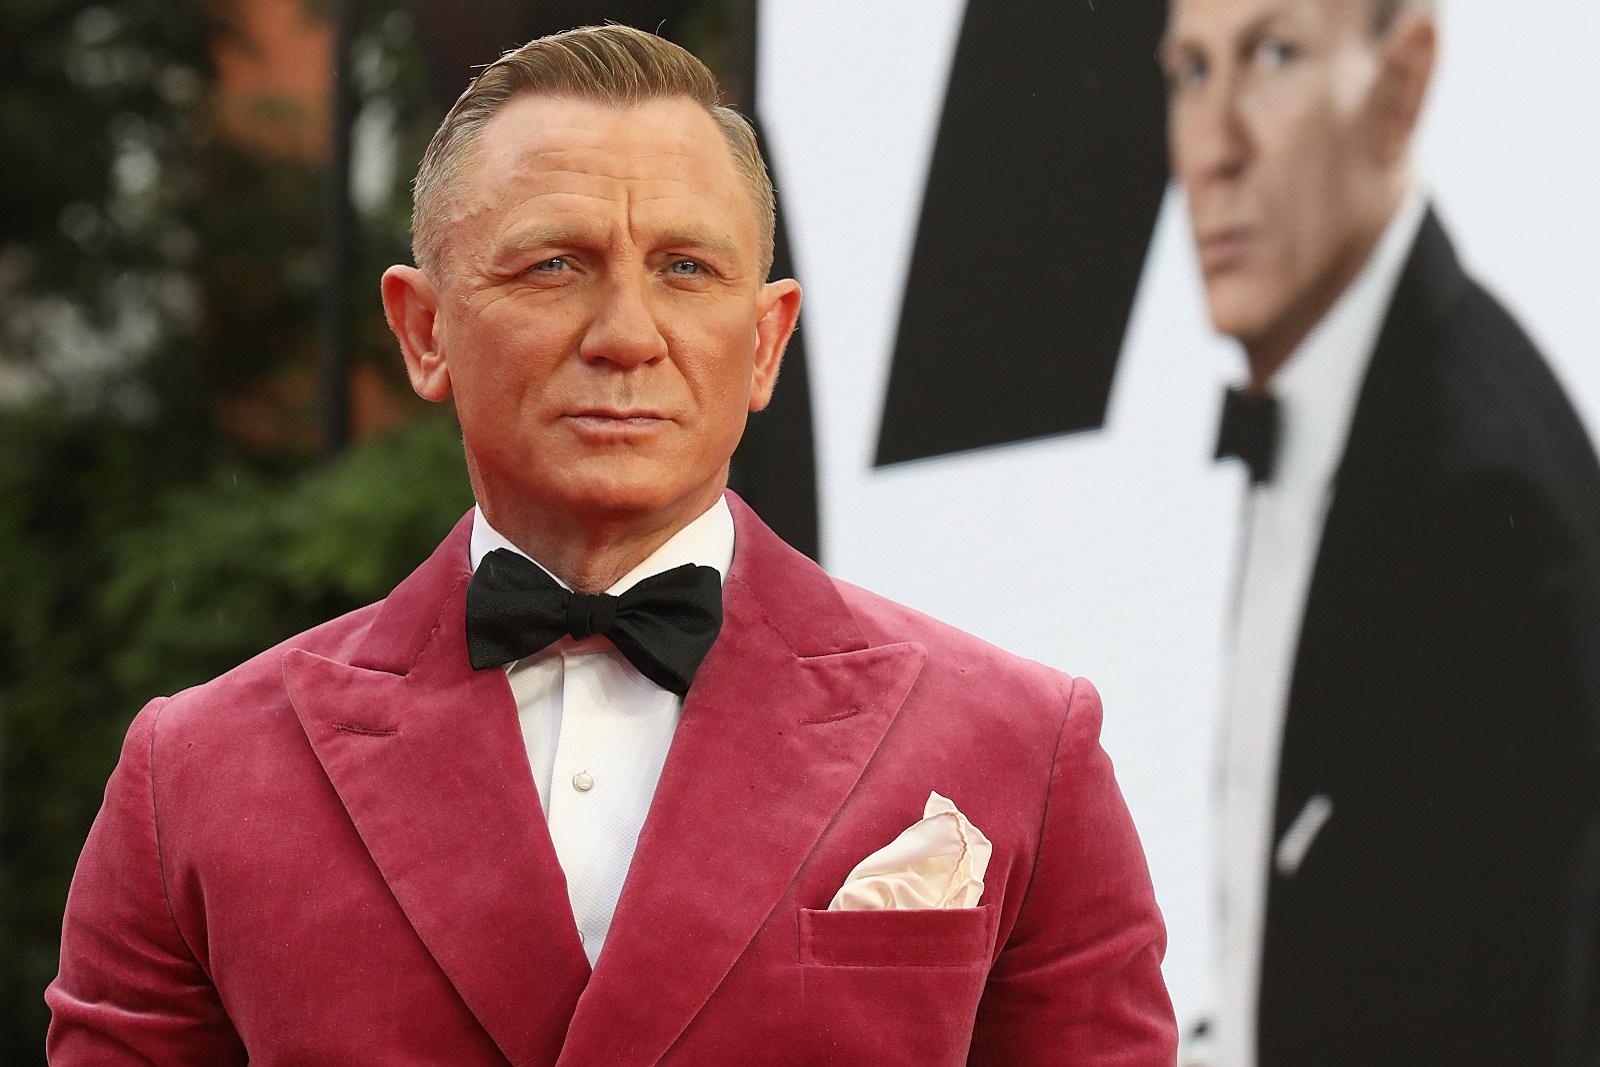 The Bond Film Daniel Craig Called 'A Bit of a S— Show'